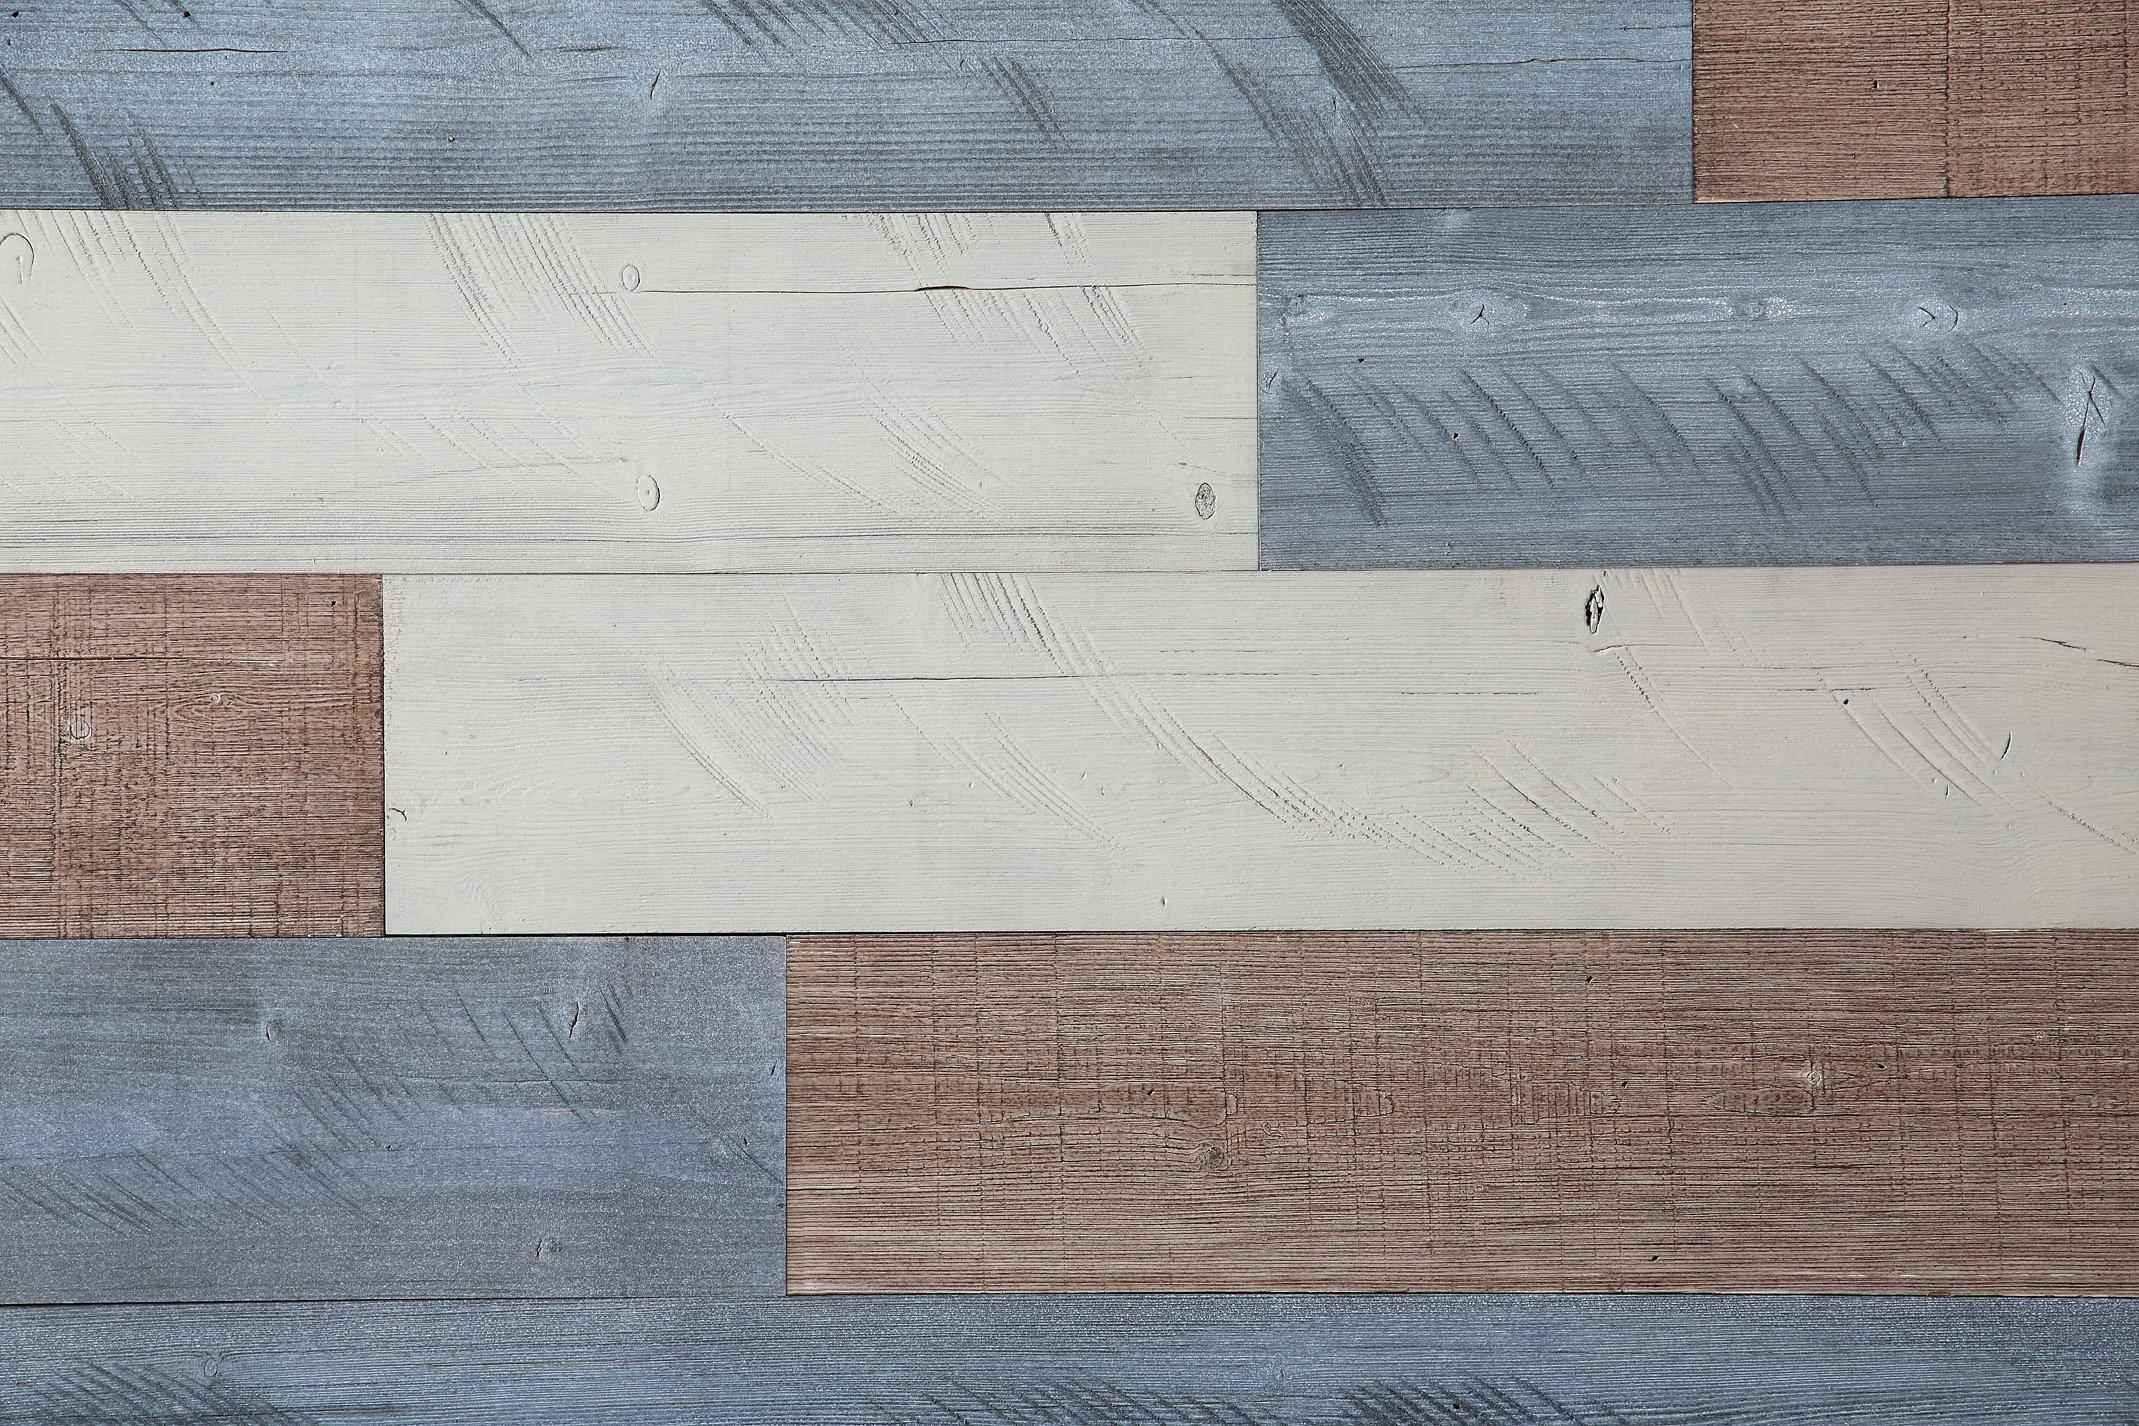 Woody Walls Peel and Stick Wood Wall Panels, Three Color Combinations, 19.5 sq. ft. per Box, Sweetened Milk, Warm Sand, Natural Gray